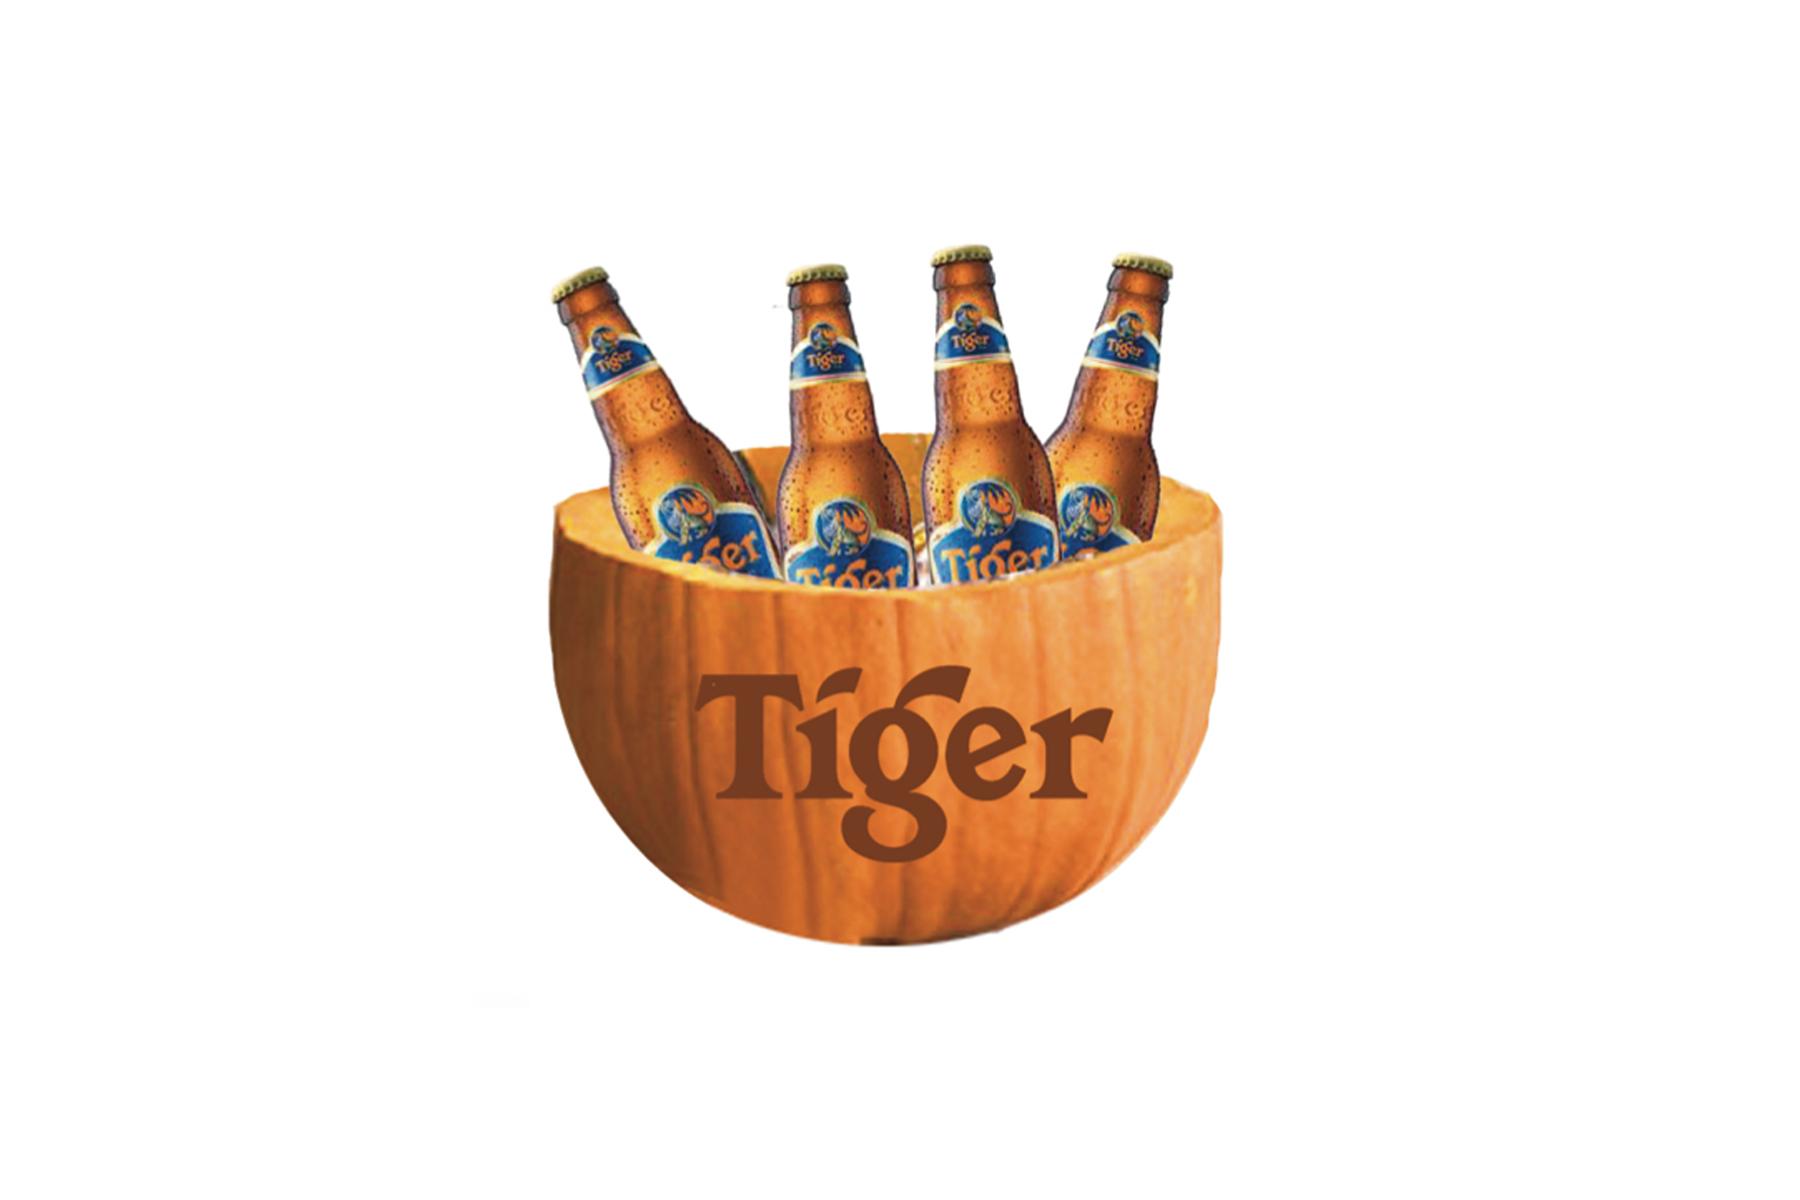 Rothco-Tiger-Haloween-promo-merchandise.jpg